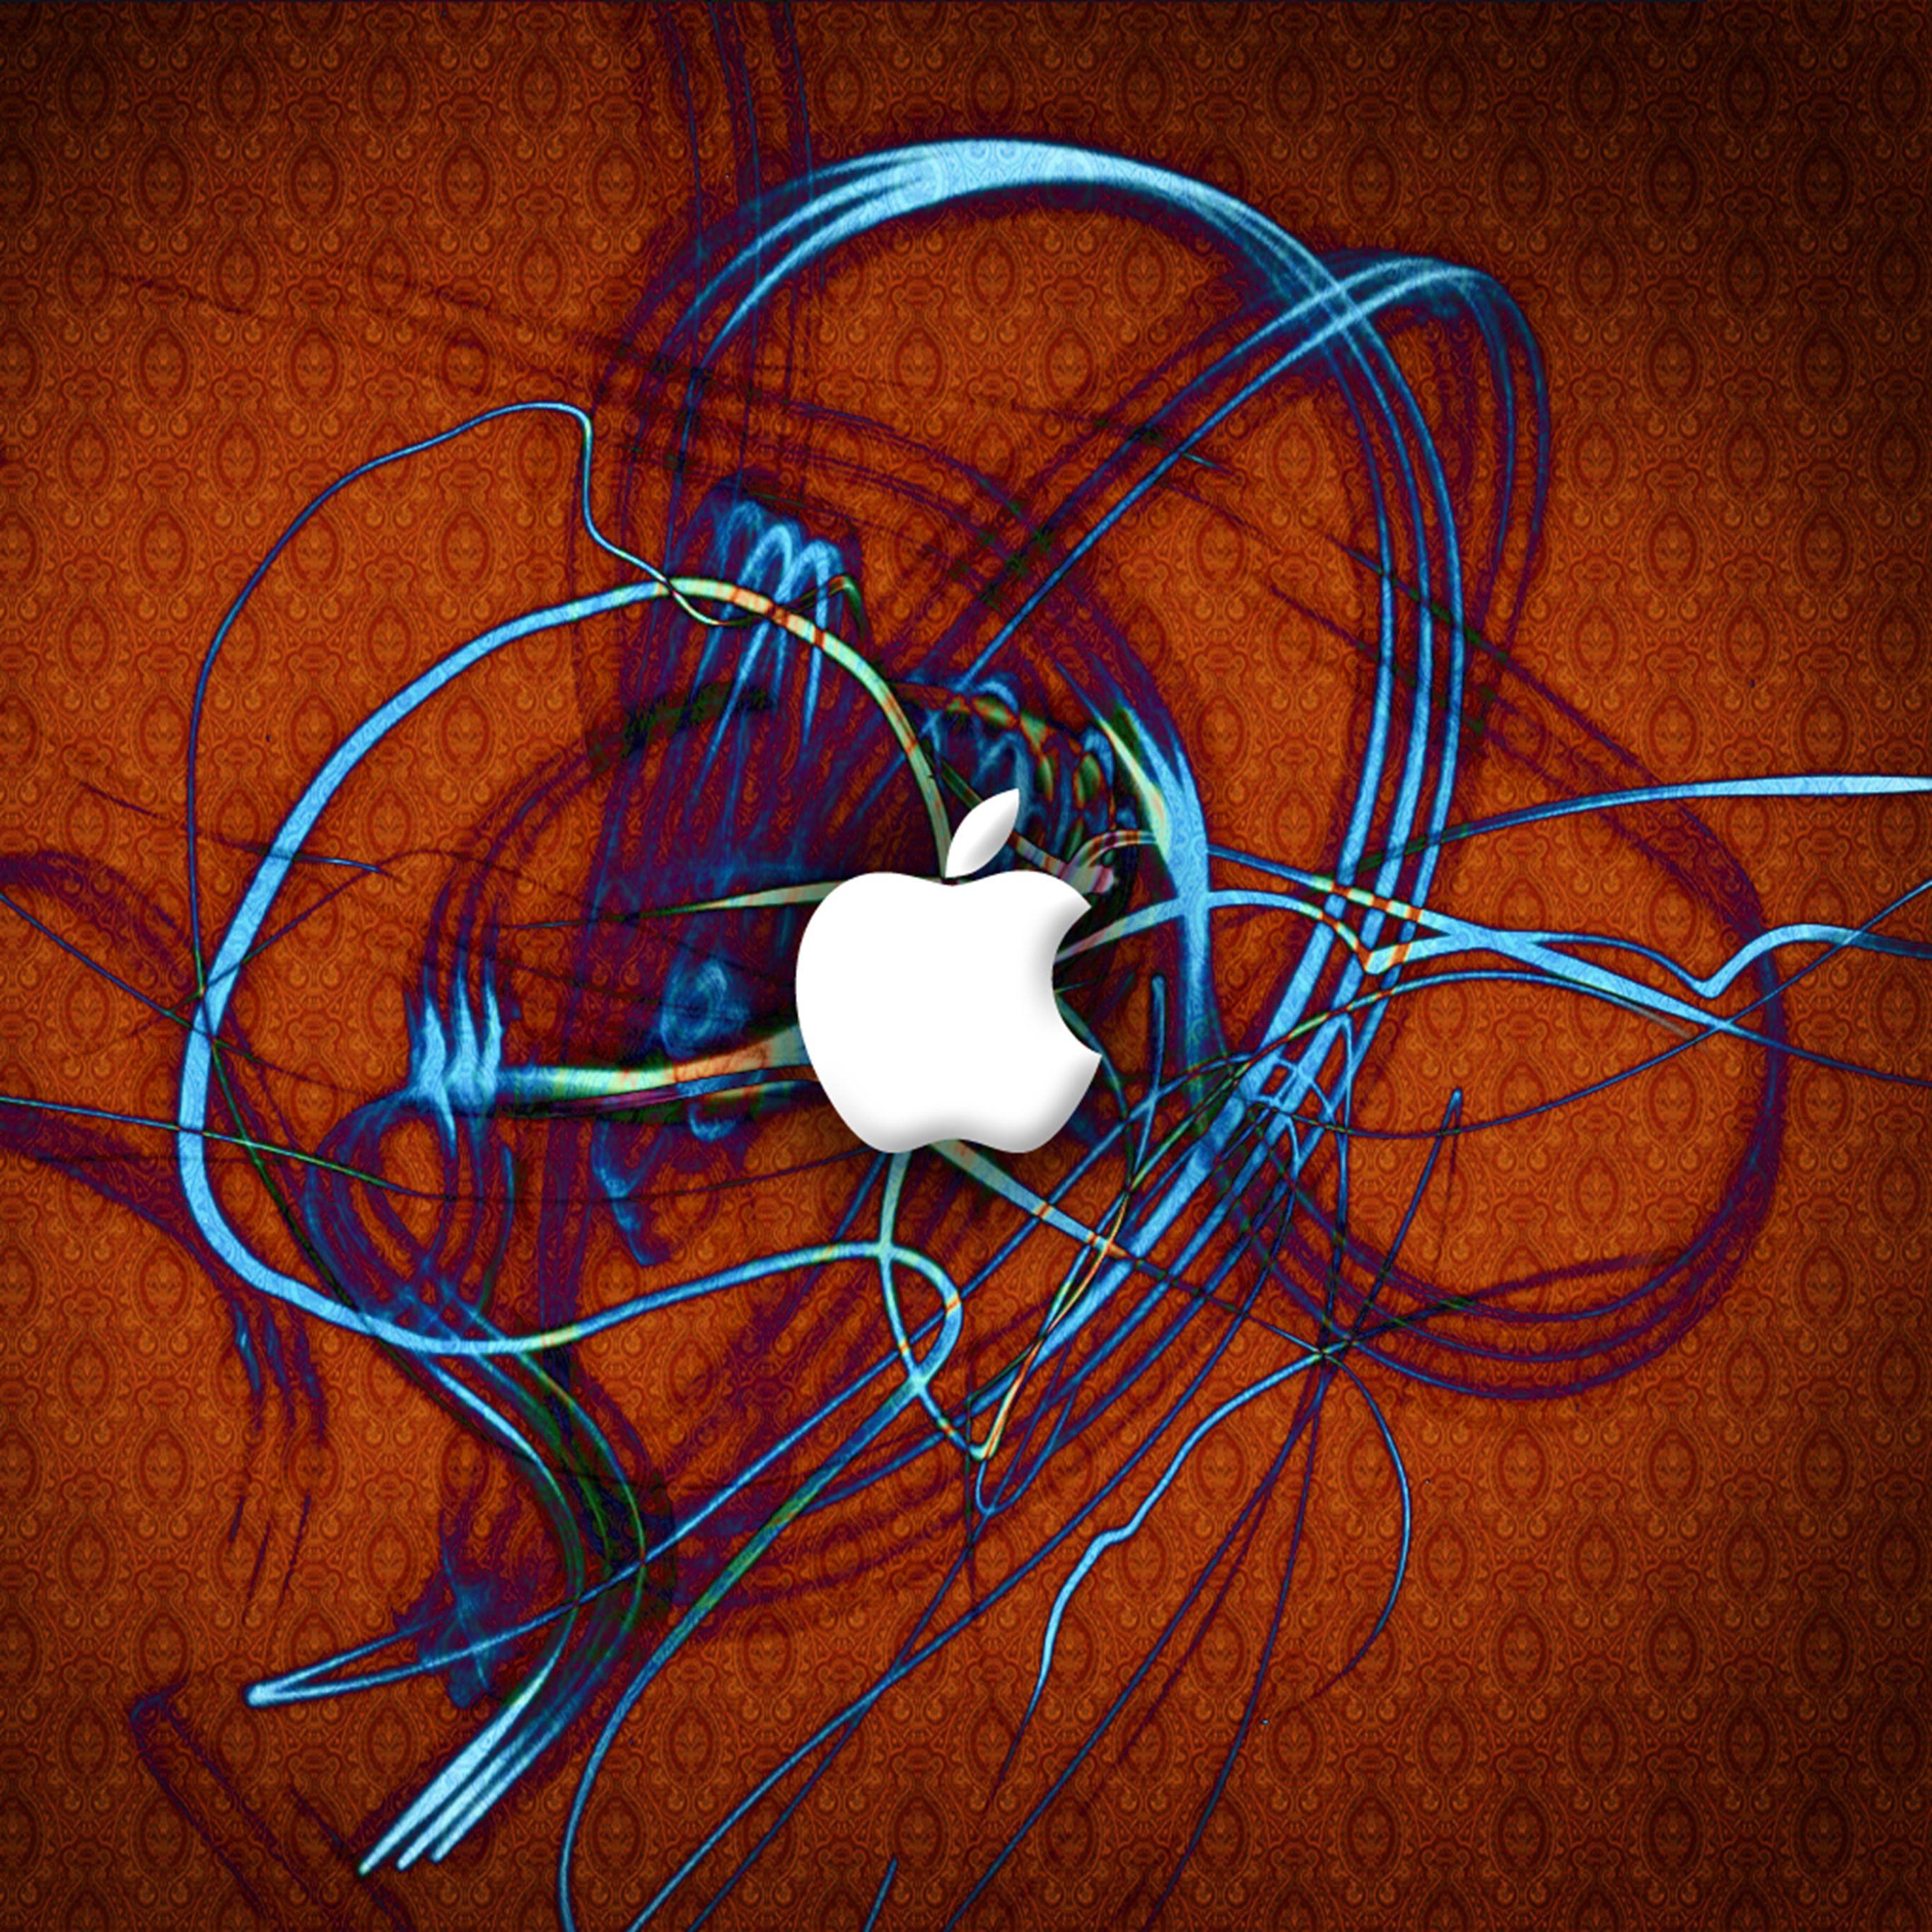 Apple Blue Ribbon Ipad Wallpaper Apple Ipad Wallpaper Apple Wallpaper Hd Ipad Wallpapers